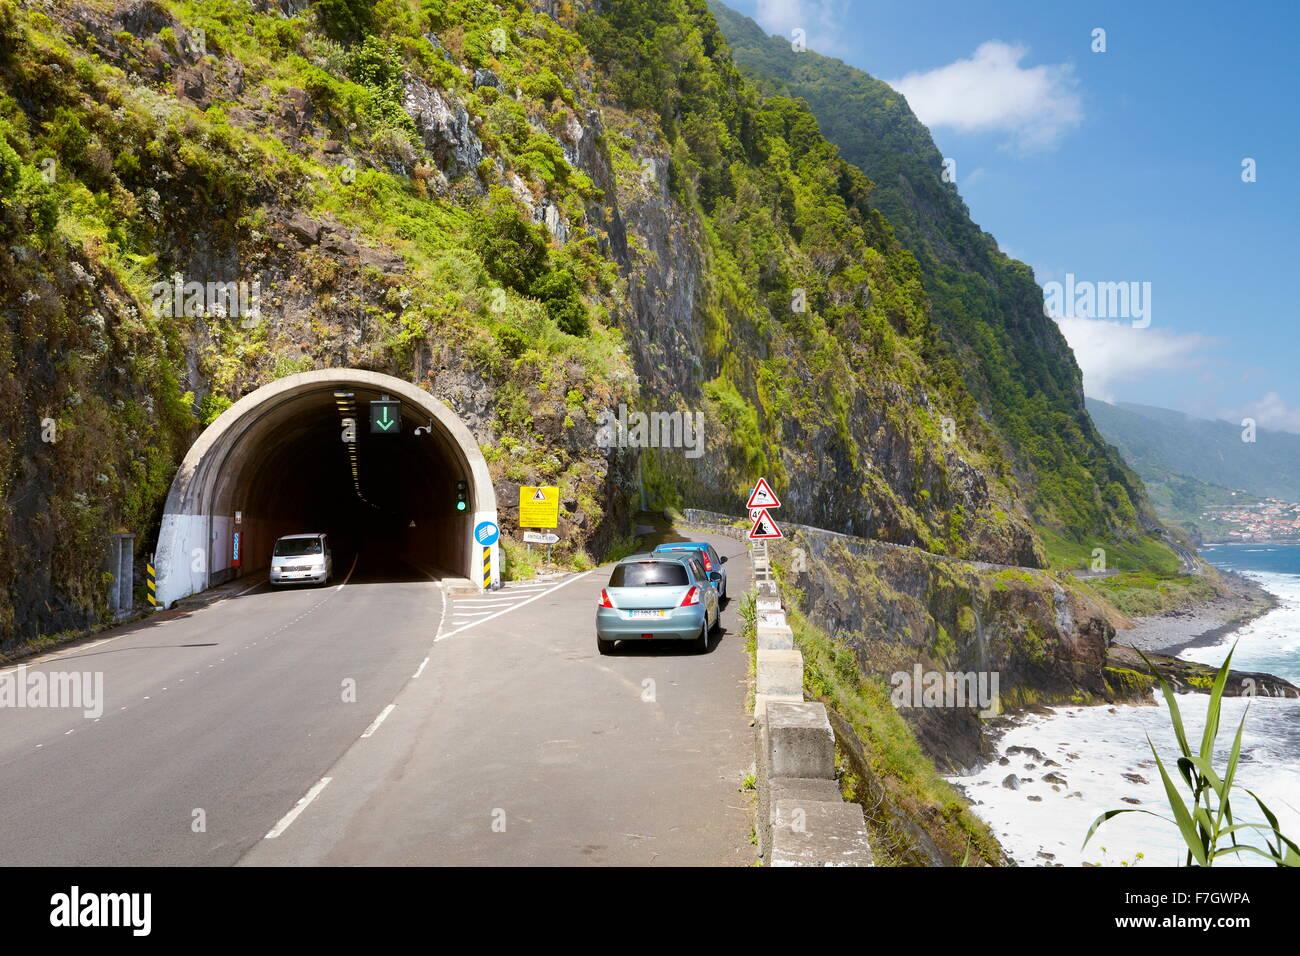 Tunnel near Ponta Delgada, Madeira Island, Portugal - Stock Image